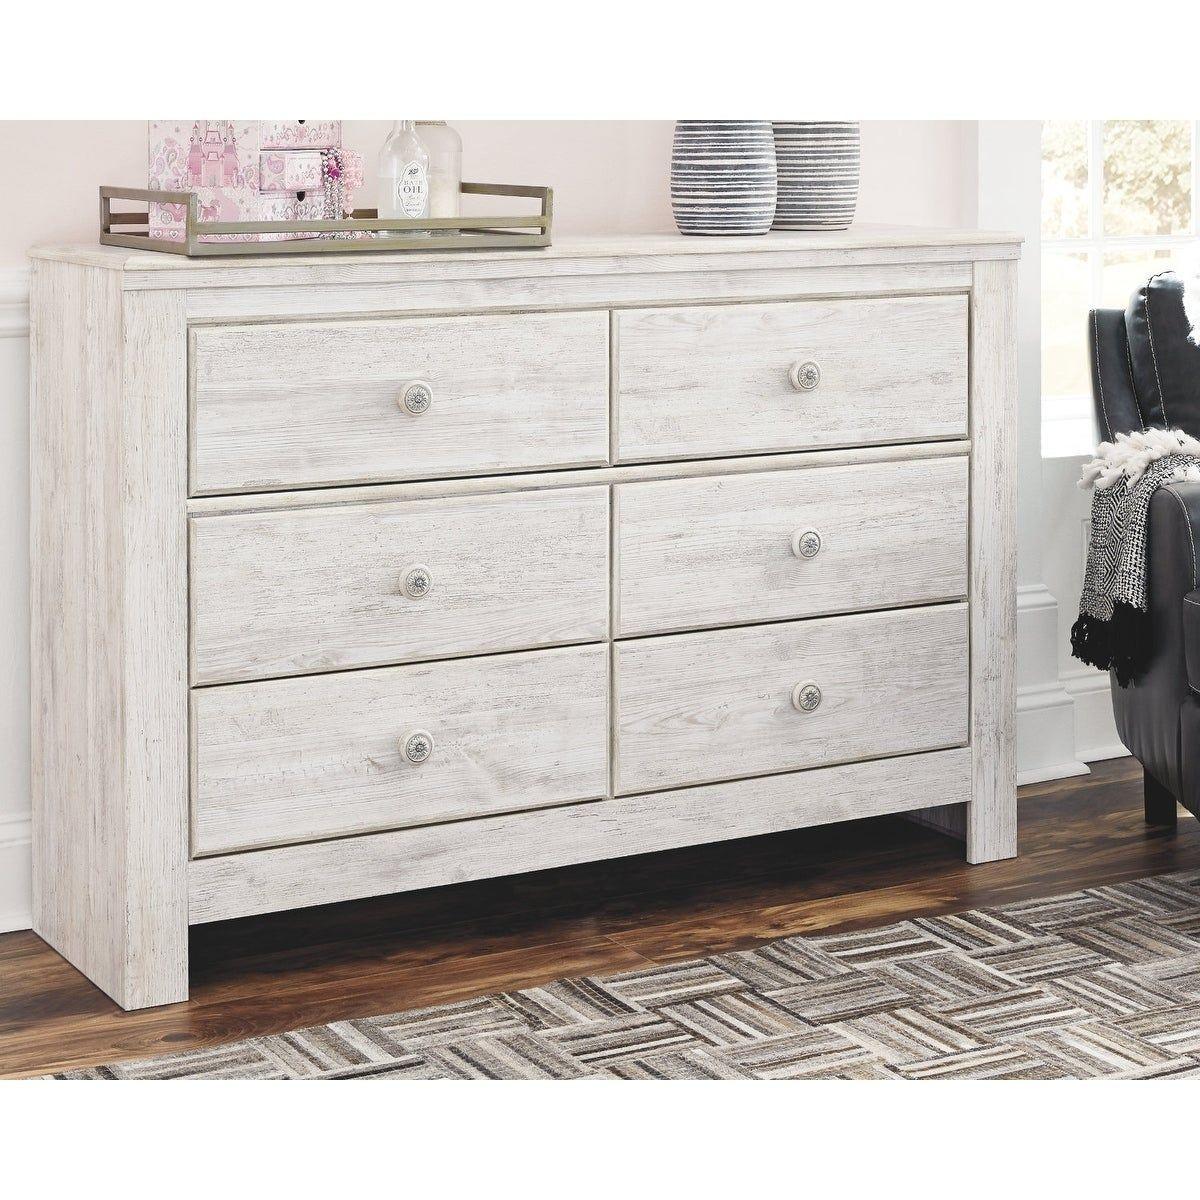 Paxberry Whitewash 6Drawer Dresser, Signature Design by